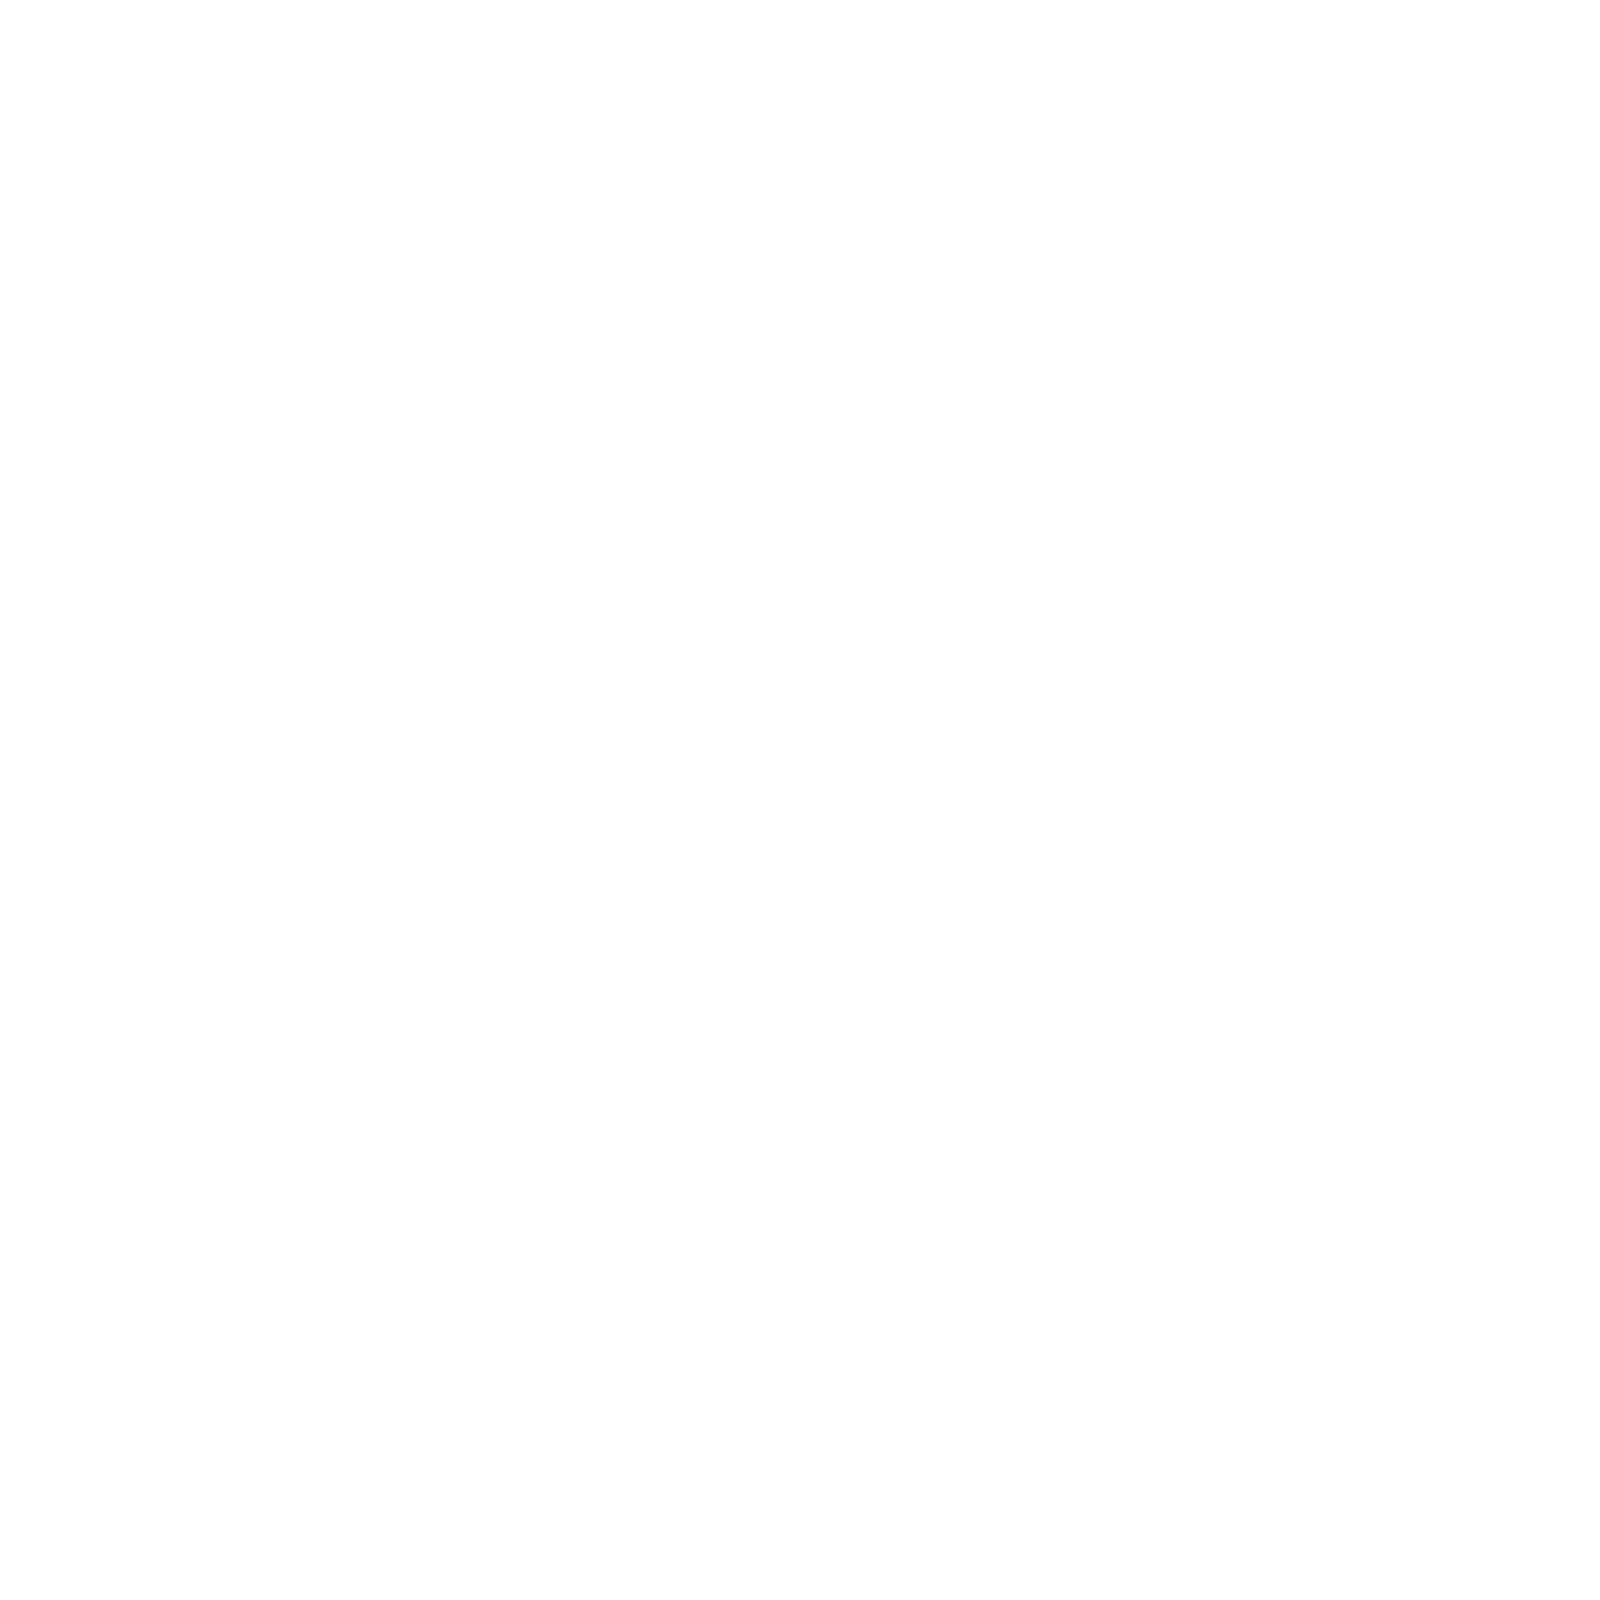 densply-project-logo